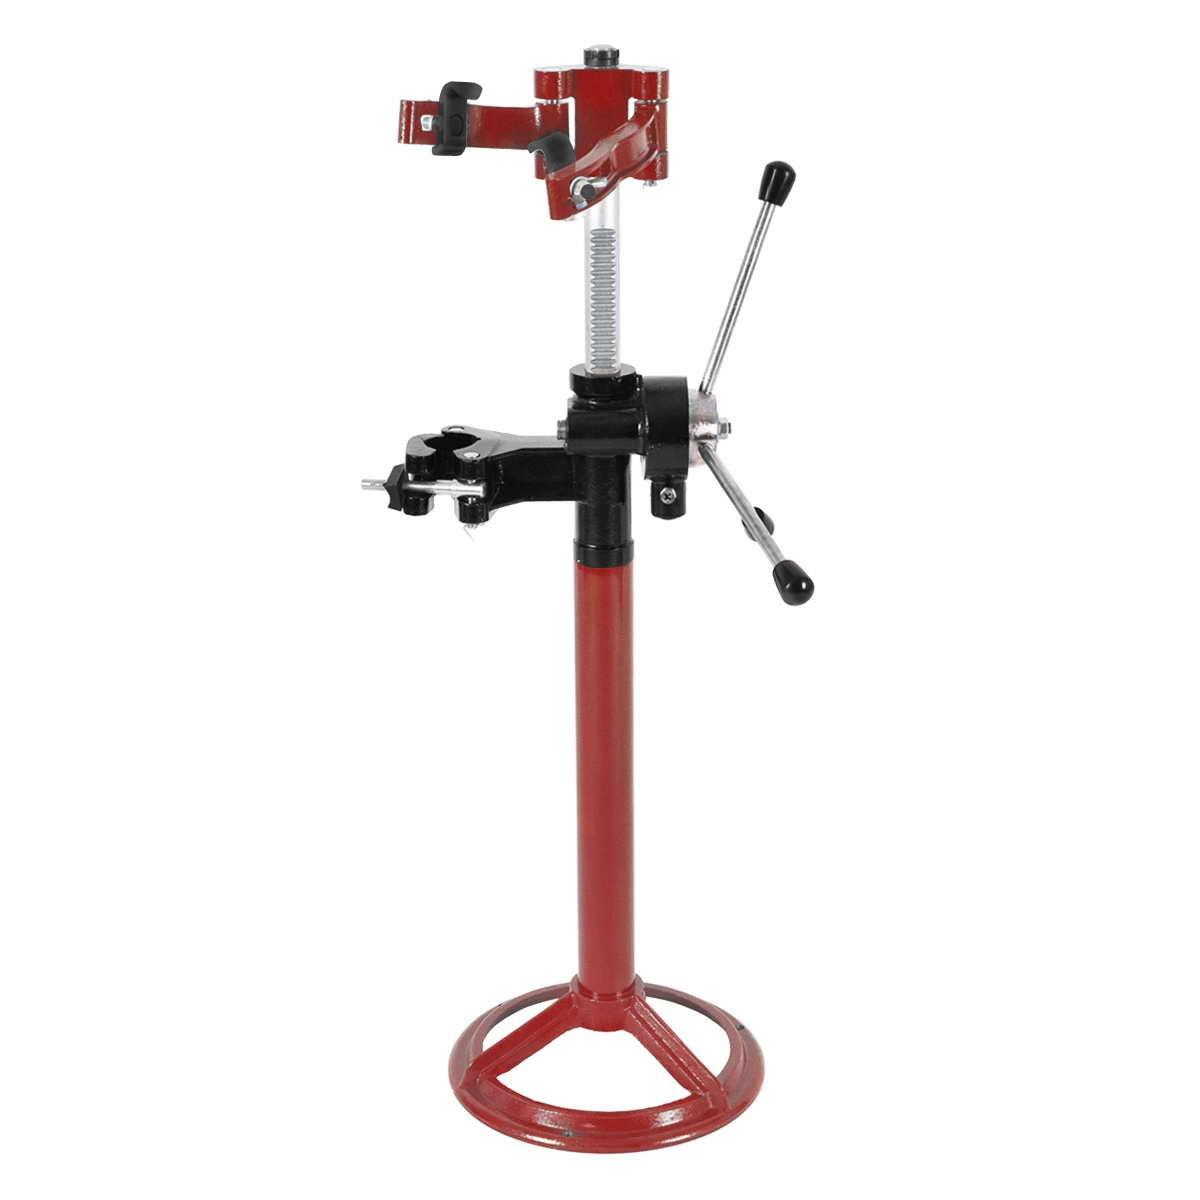 Toolsempire Hand Operate Strut Coil Spring Press Compressor 20 inch Auto Equipment Compress Auto Equipment Tool